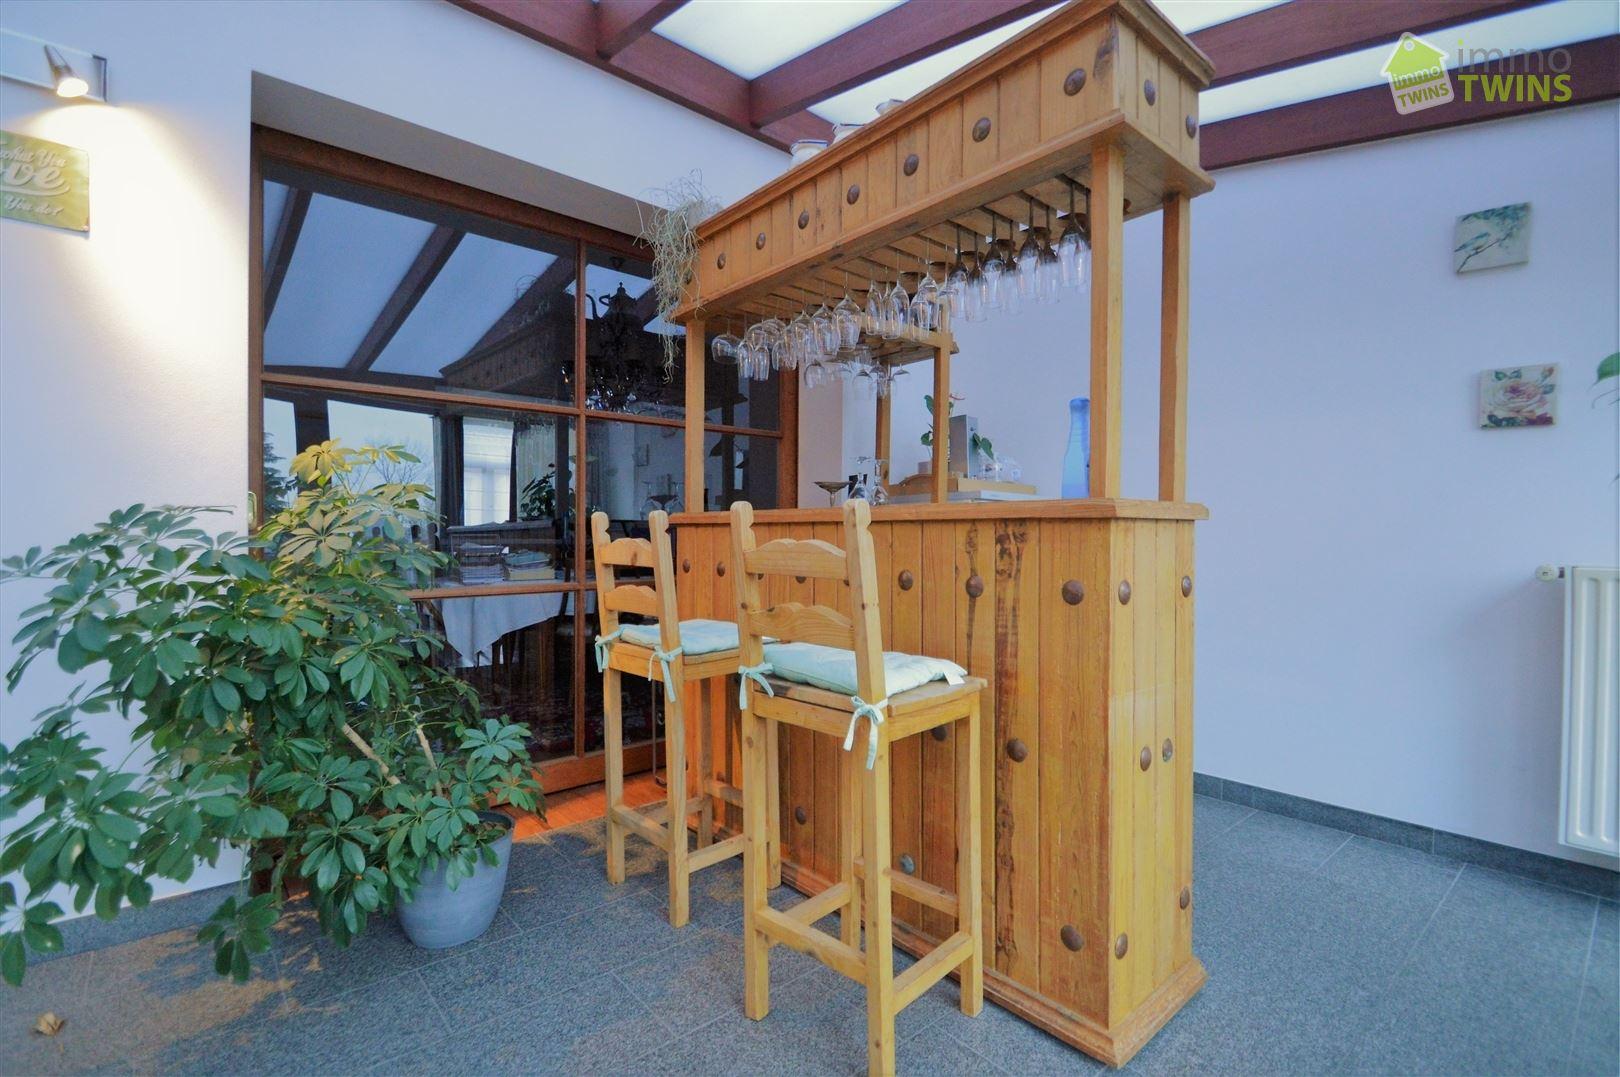 Foto 12 : Duplex/Penthouse te 2890 SINT-AMANDS (België) - Prijs € 449.000